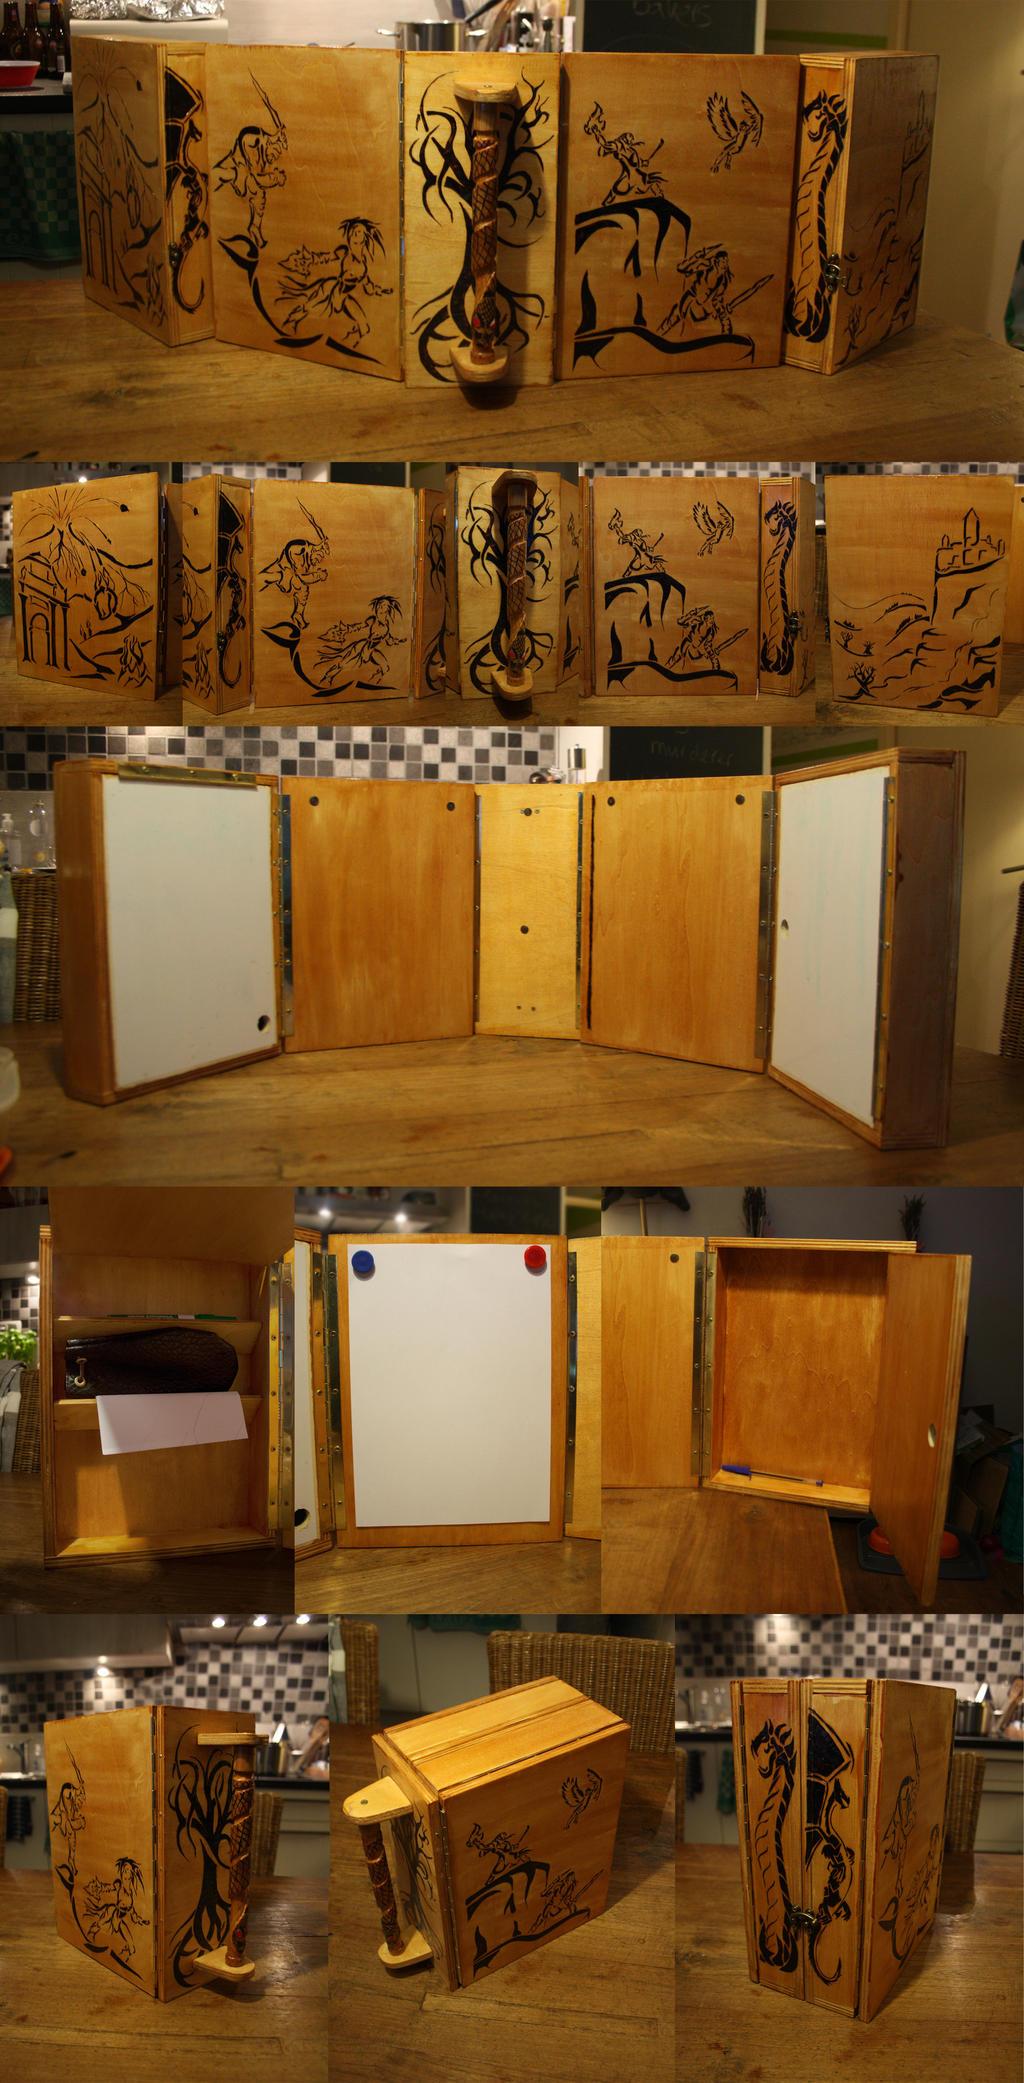 Dungeon Master Room Design